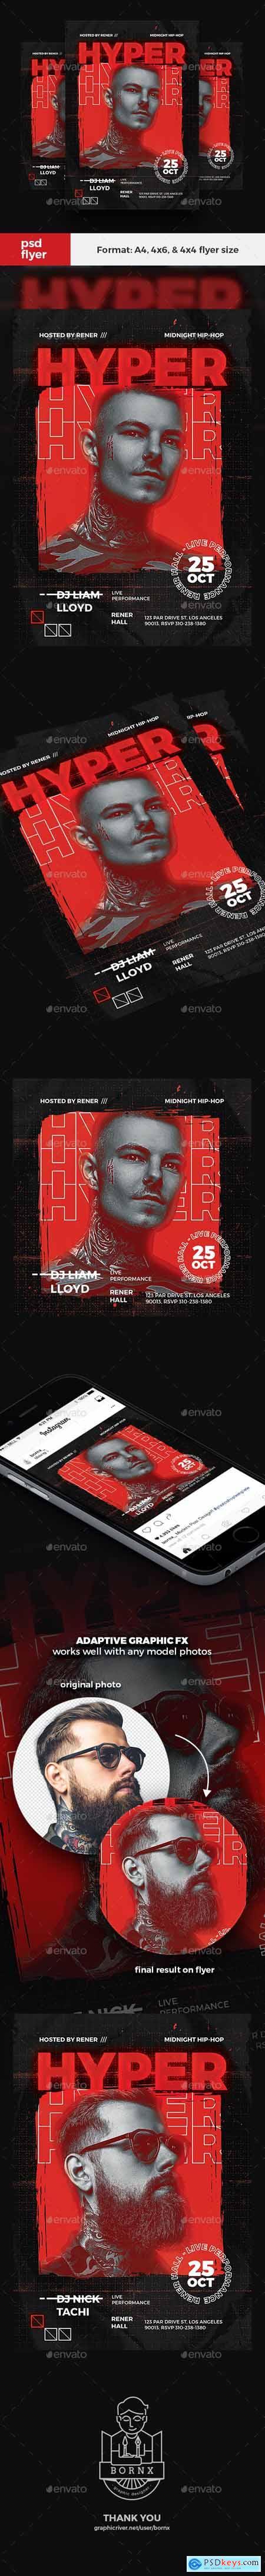 Hip Hop DJ Flyer 24484891